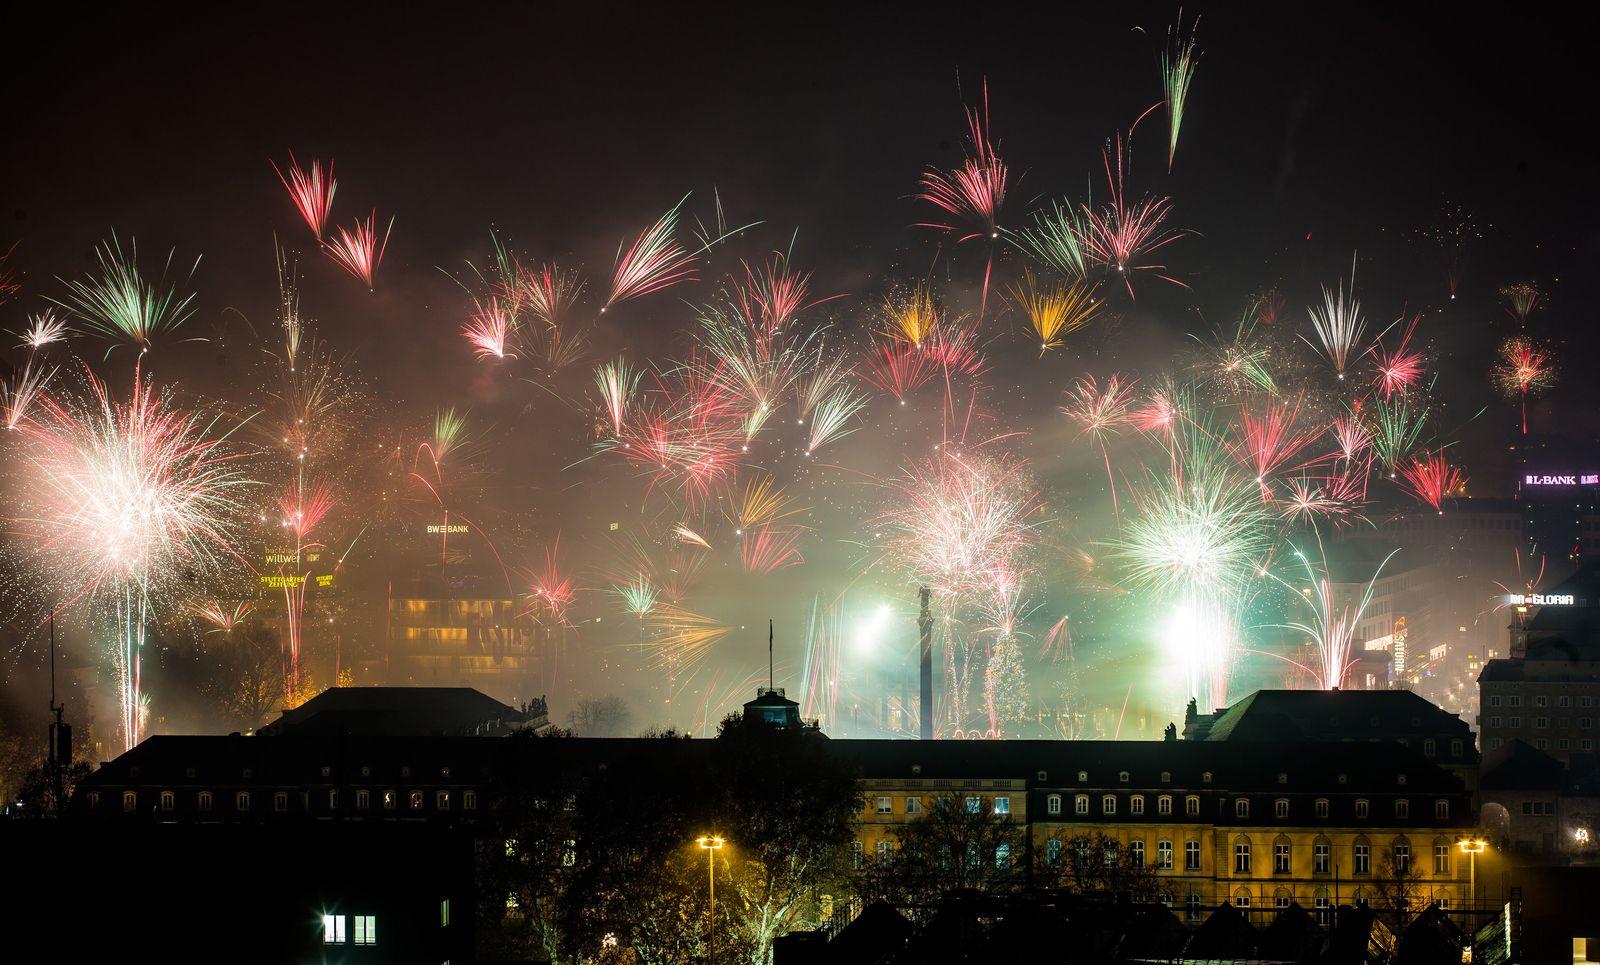 Silvesterfeuerwerk - Stuttgart